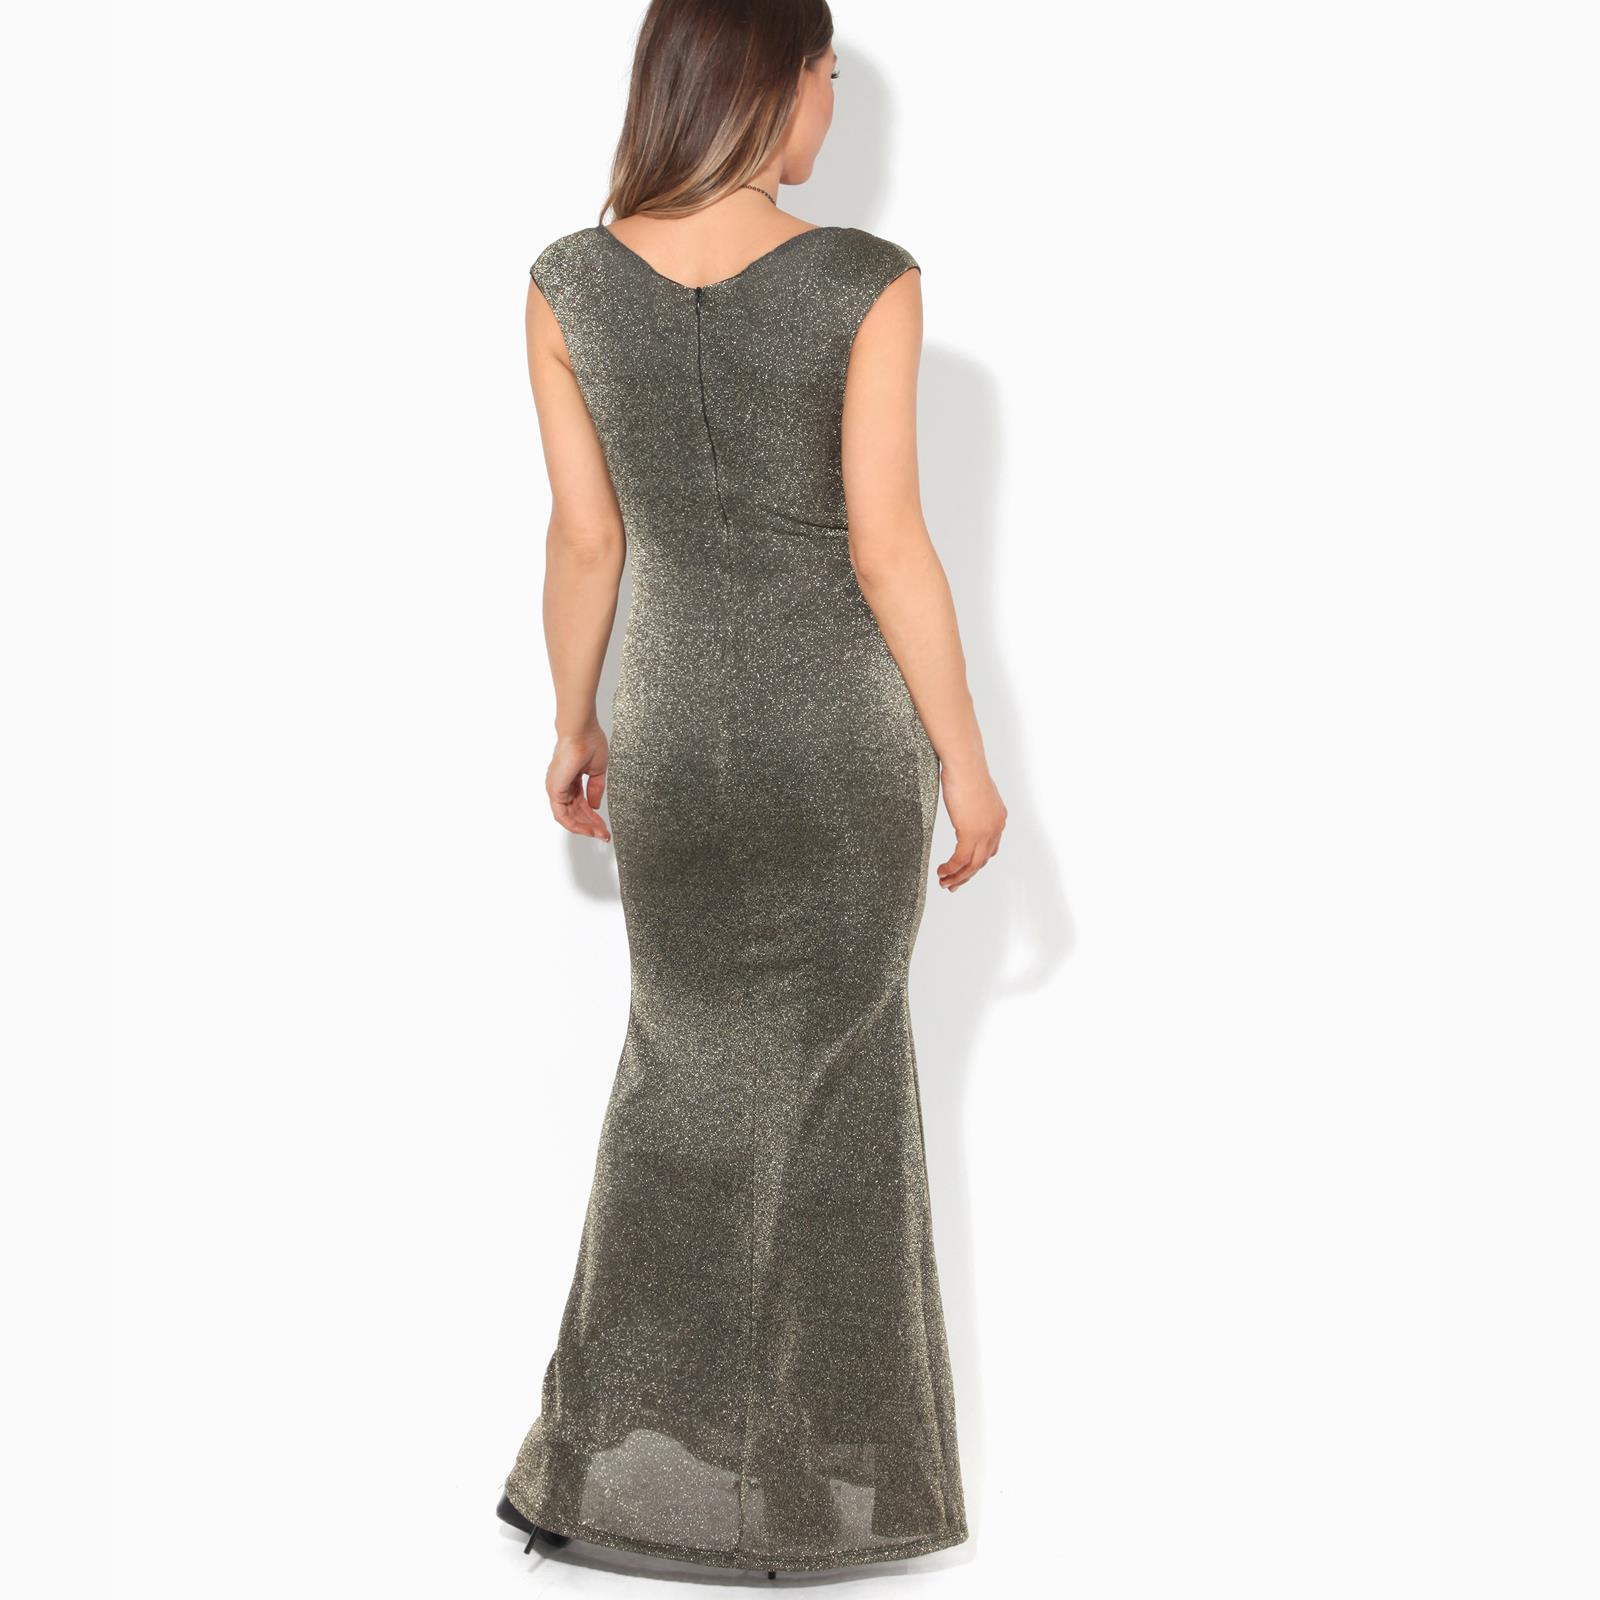 Womens-Ladies-Glitter-Party-Dress-Evening-Lurex-Fishtail-Maxi-Off-Shoulder thumbnail 4